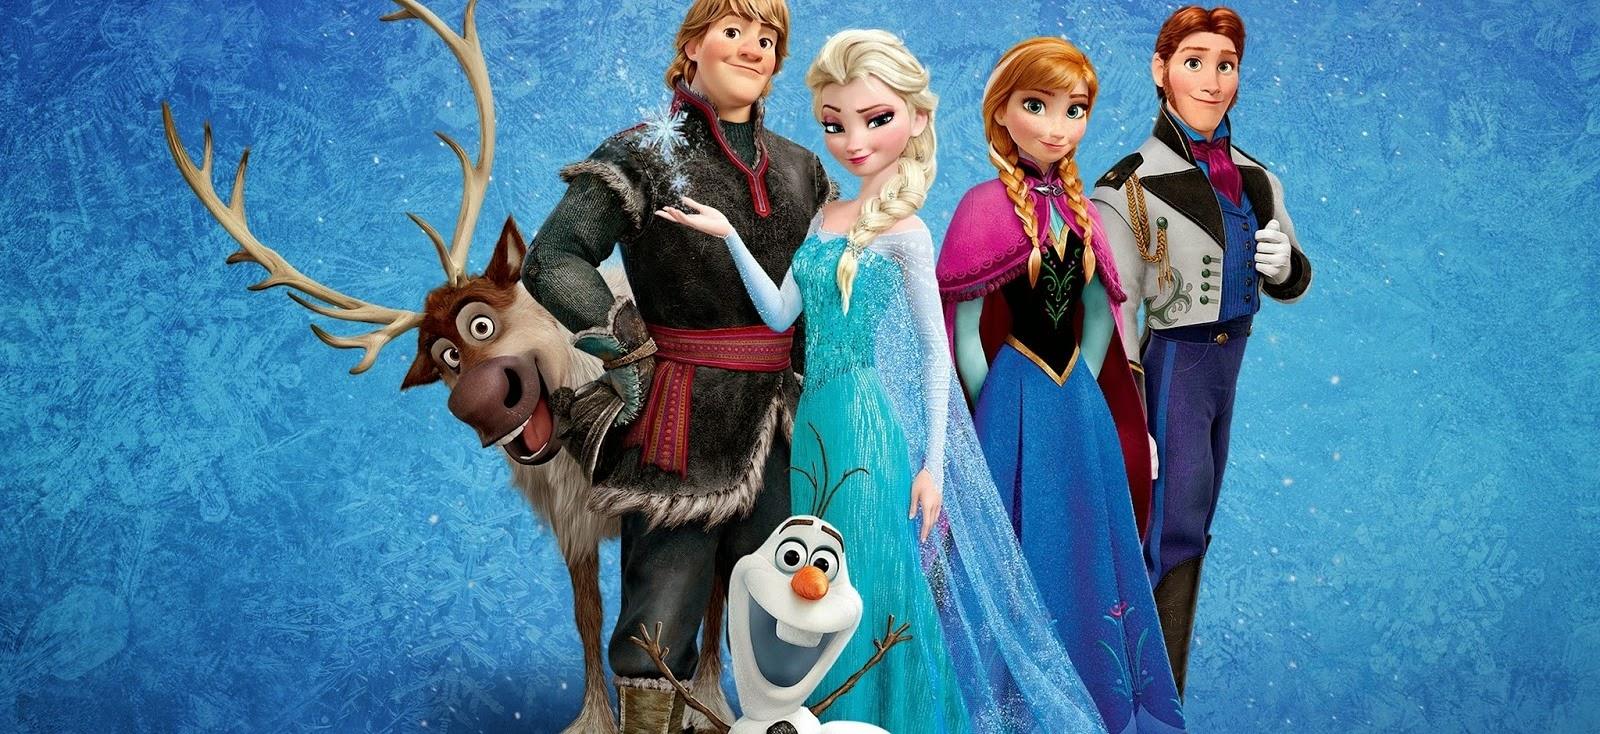 Disney anuncia desenvolvimento de Frozen 2 com Jennifer Lee & Chris Buck